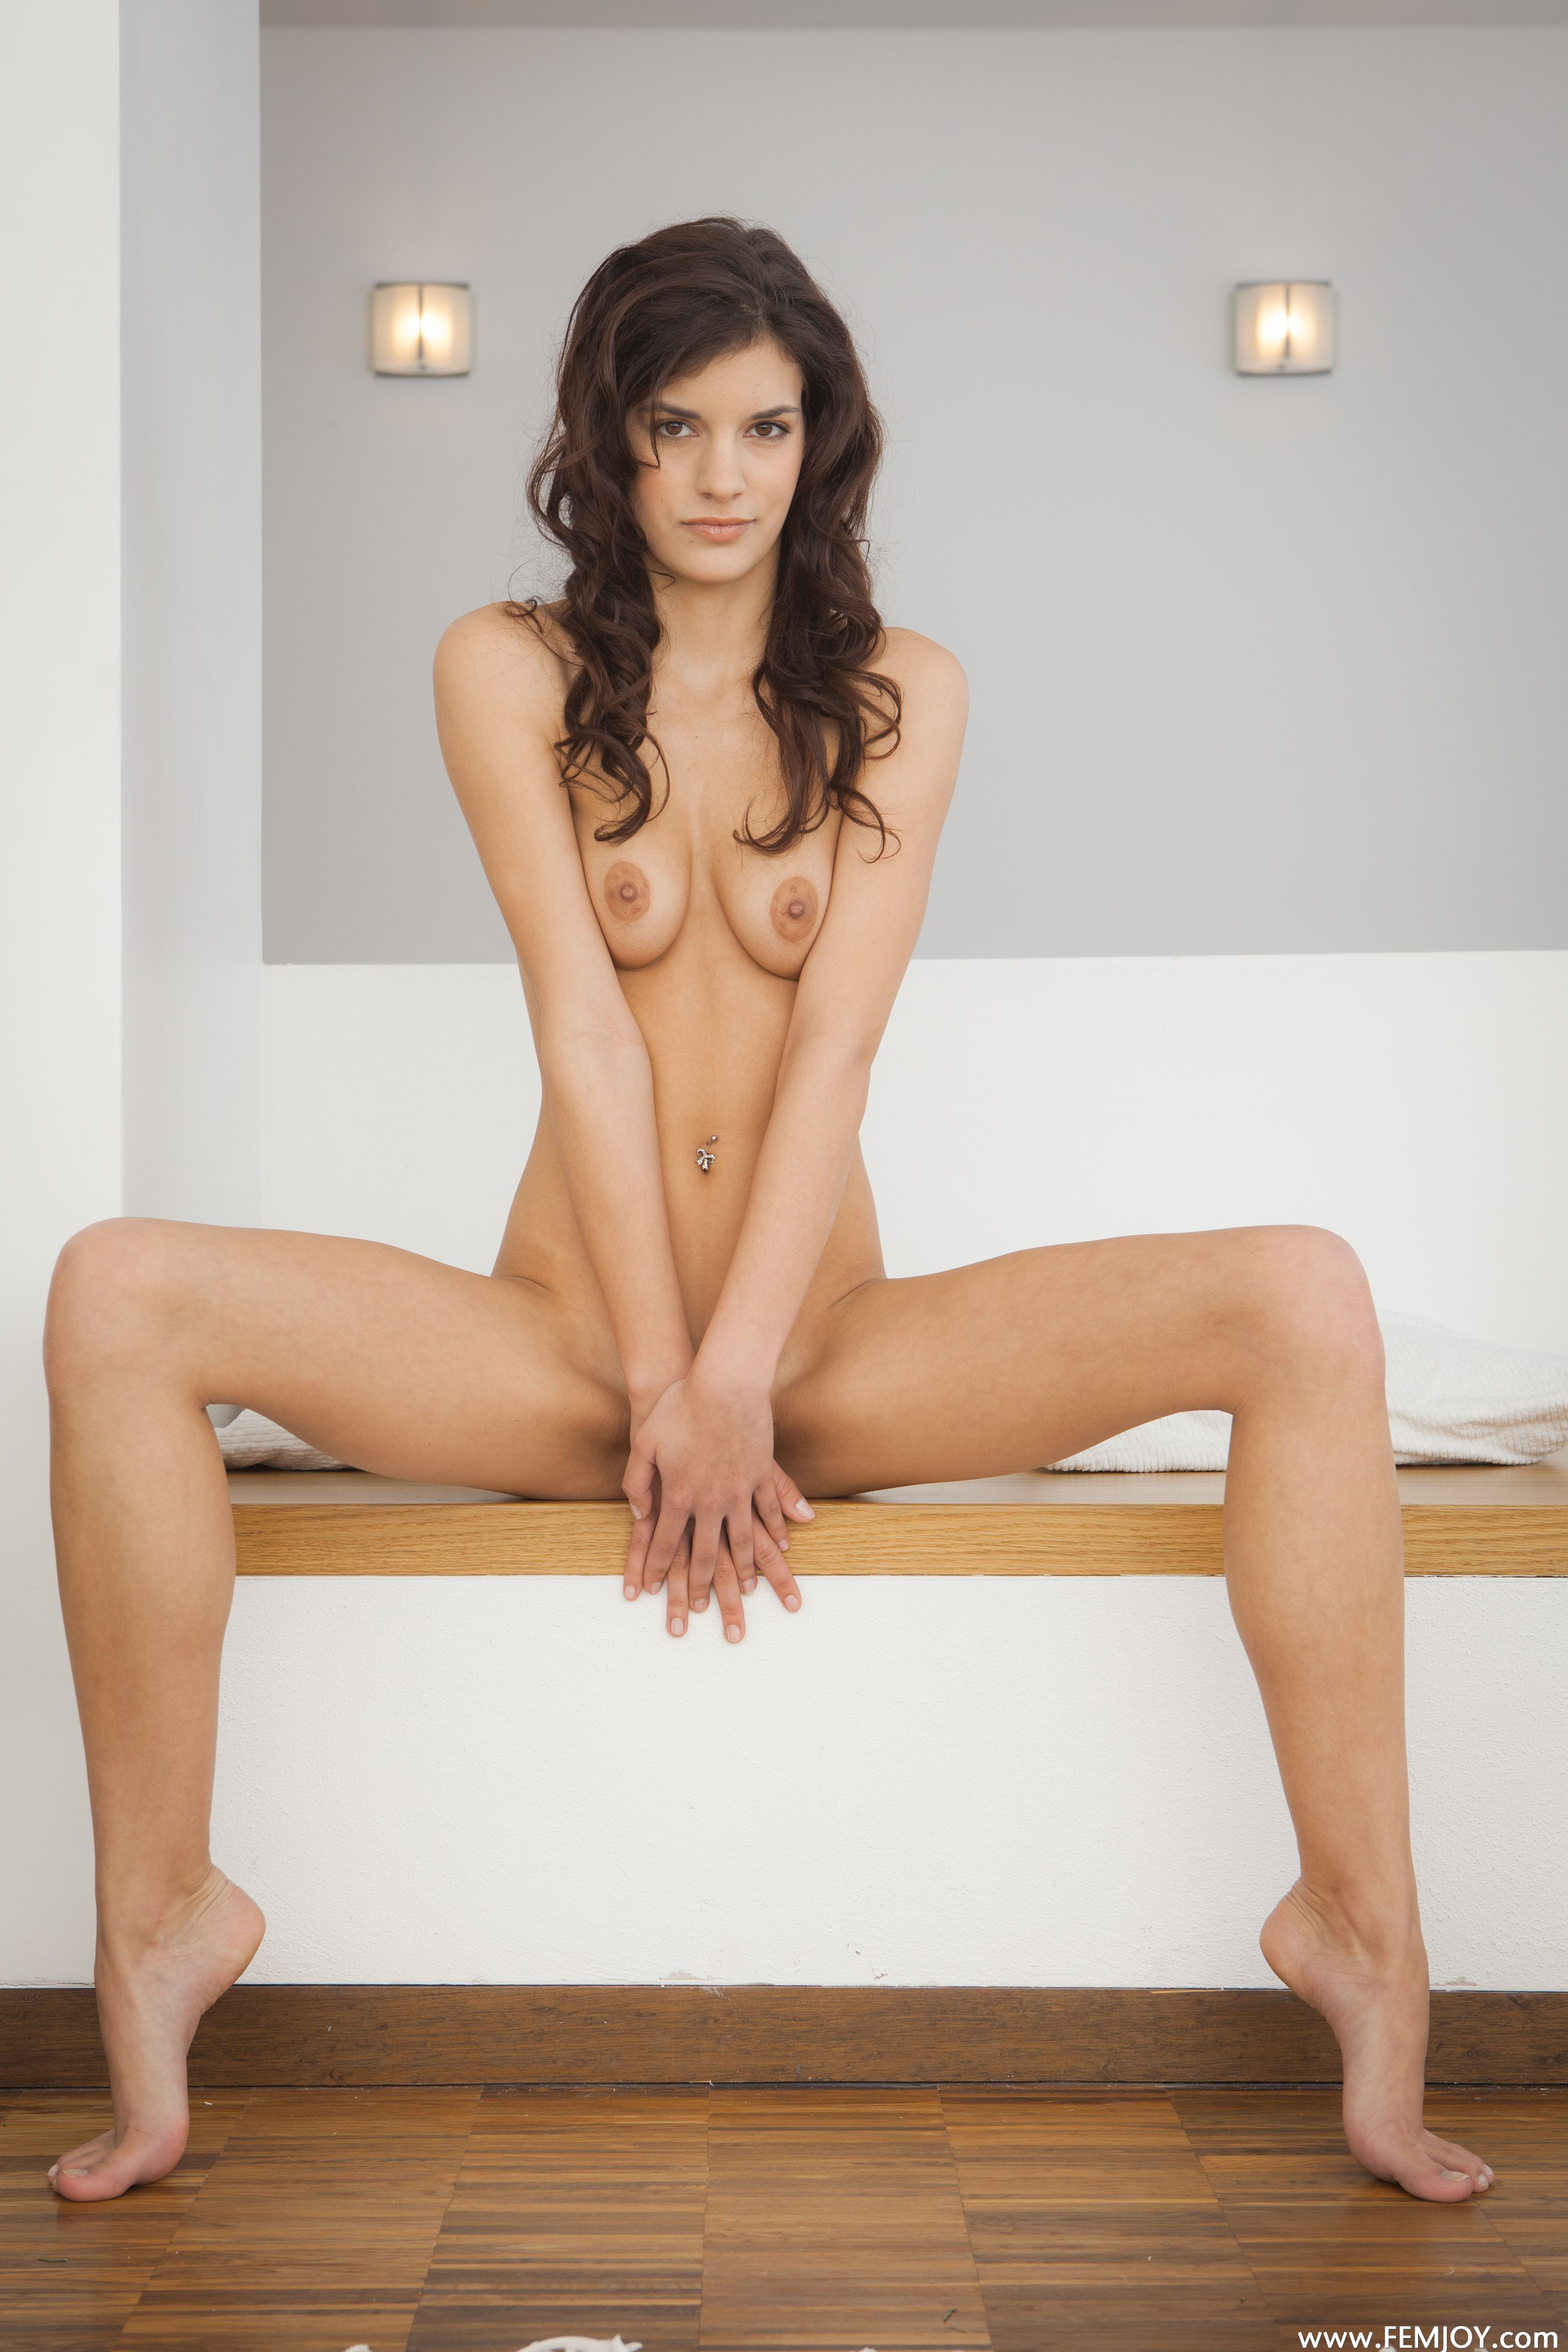 http://i2.imageban.ru/out/2013/11/13/24e1662a757dbf79baf2ecde6cdfe66a.jpg